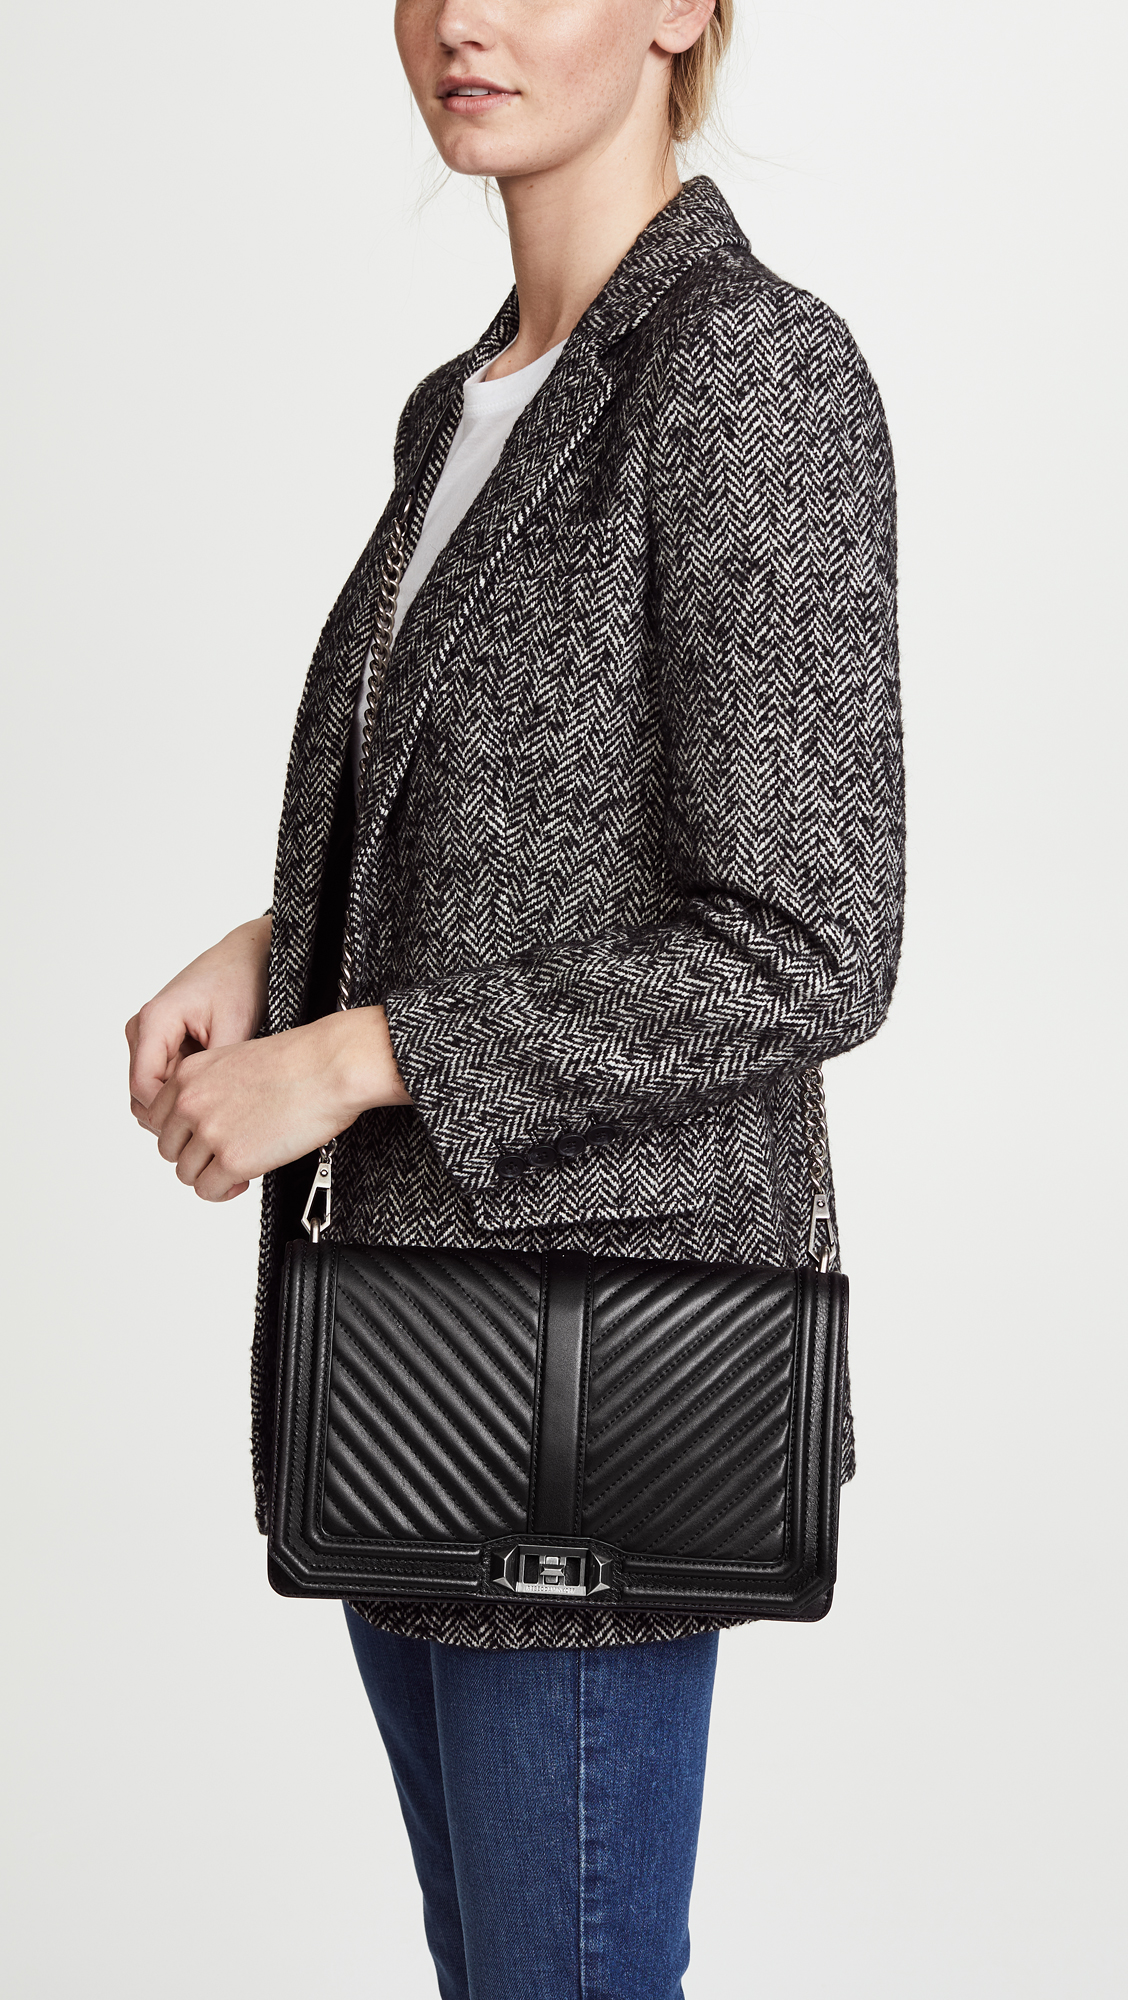 6b189c76e Rebecca Minkoff Chevron Quilted Slim Love Cross Body Bag | SHOPBOP